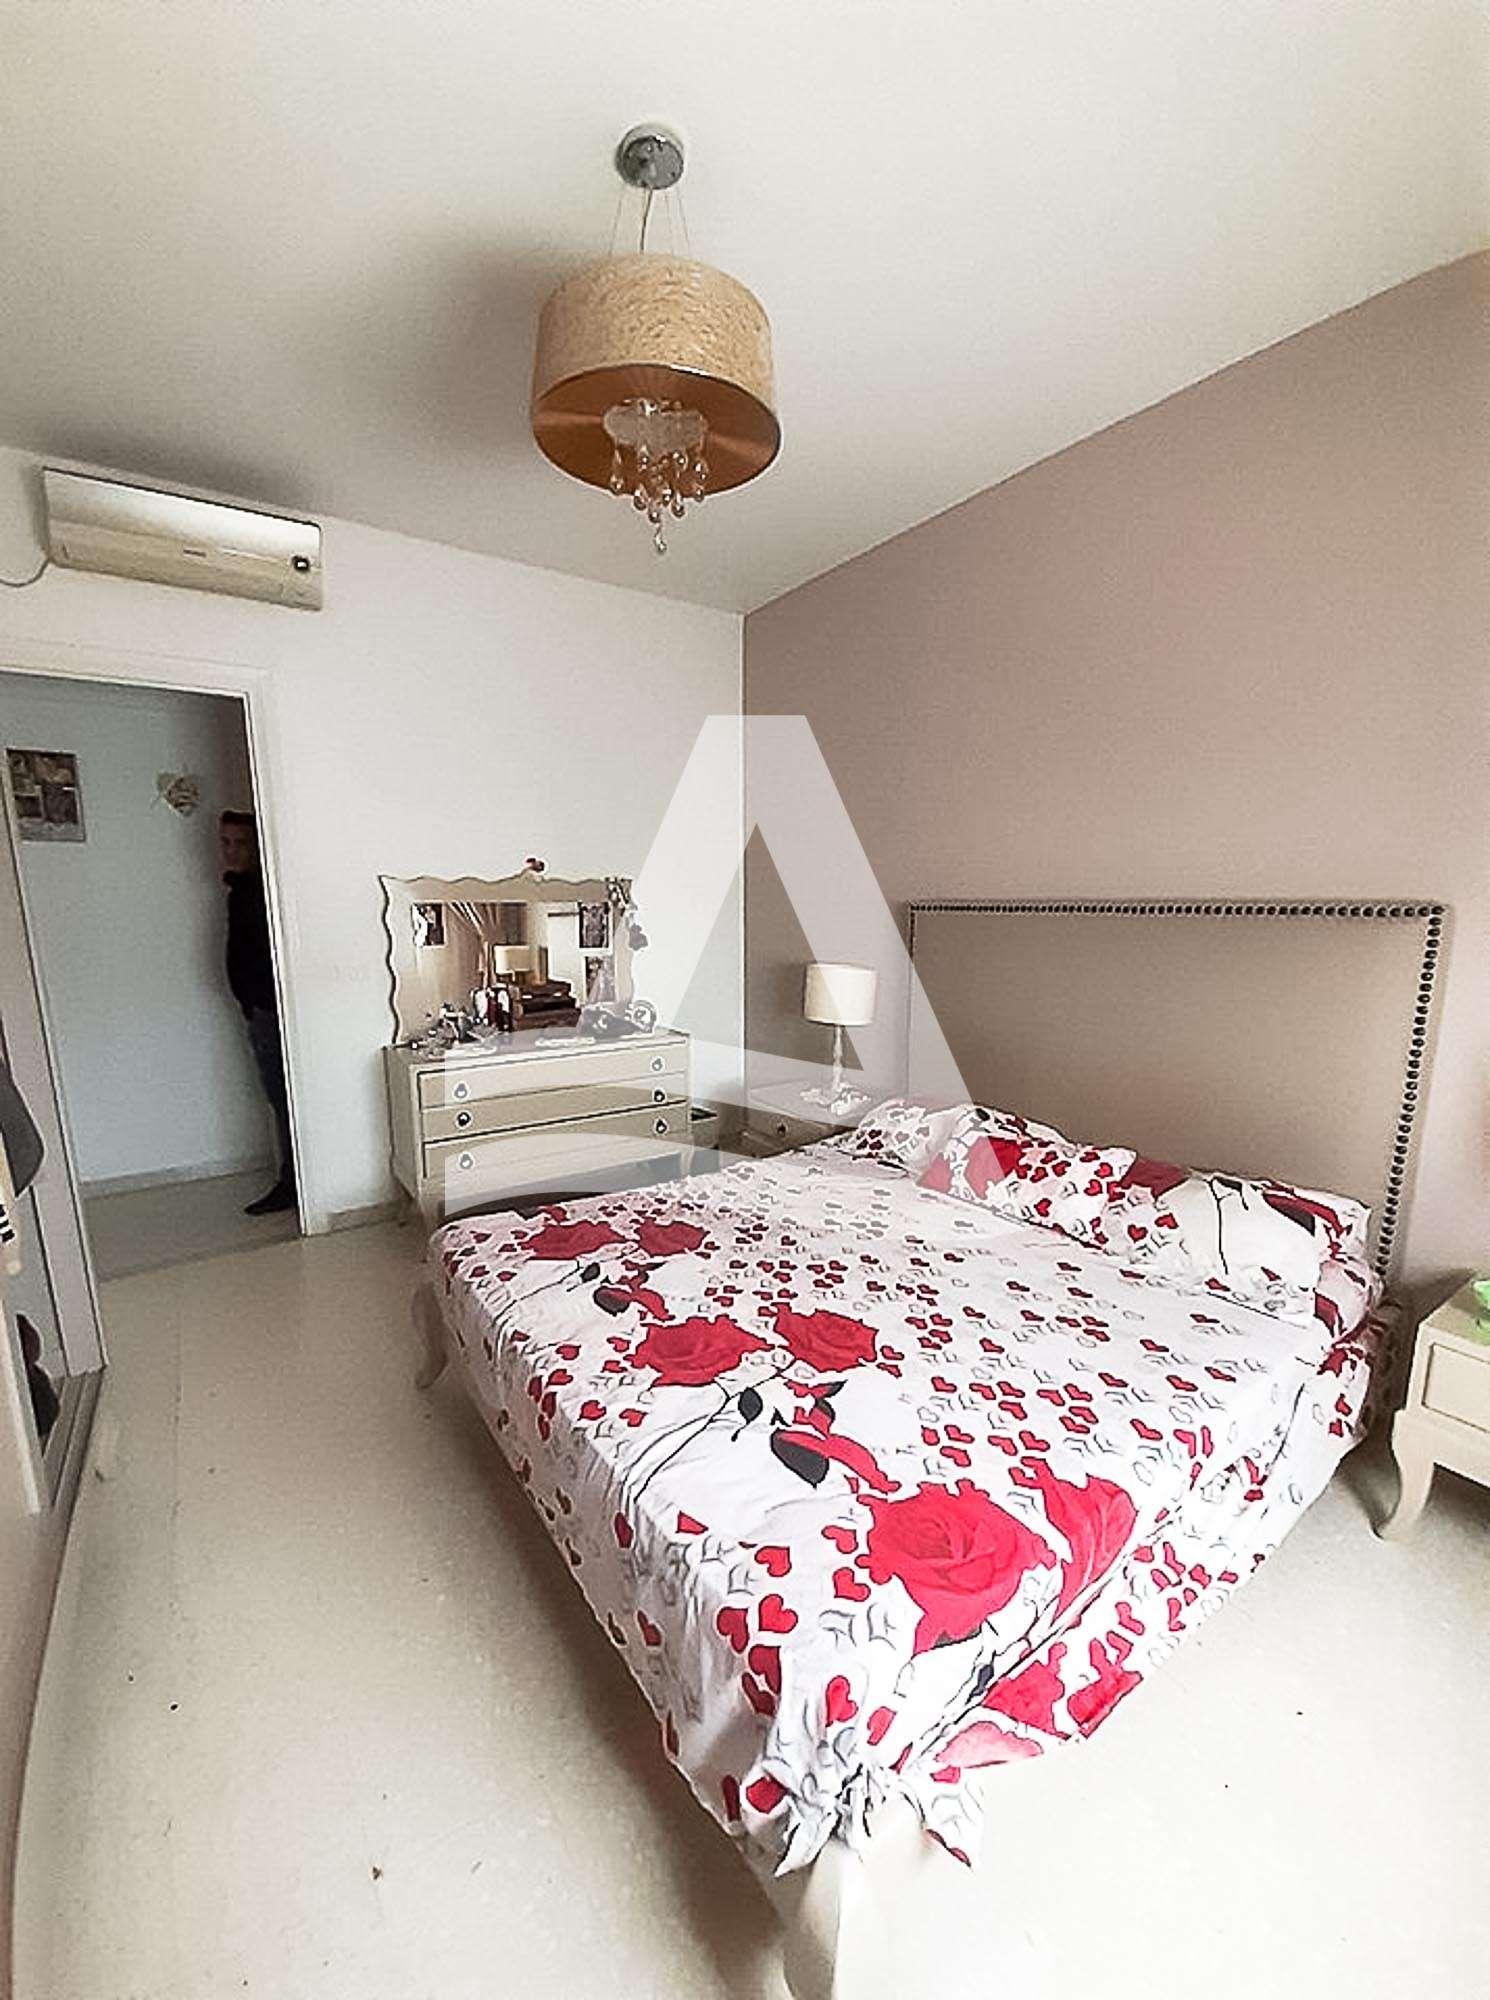 httpss3.amazonaws.comlogimoaws_Arcane_immobilière_la_Marsa-_location_-_vente_la_marsa_9_sur_16_1574071698429-1